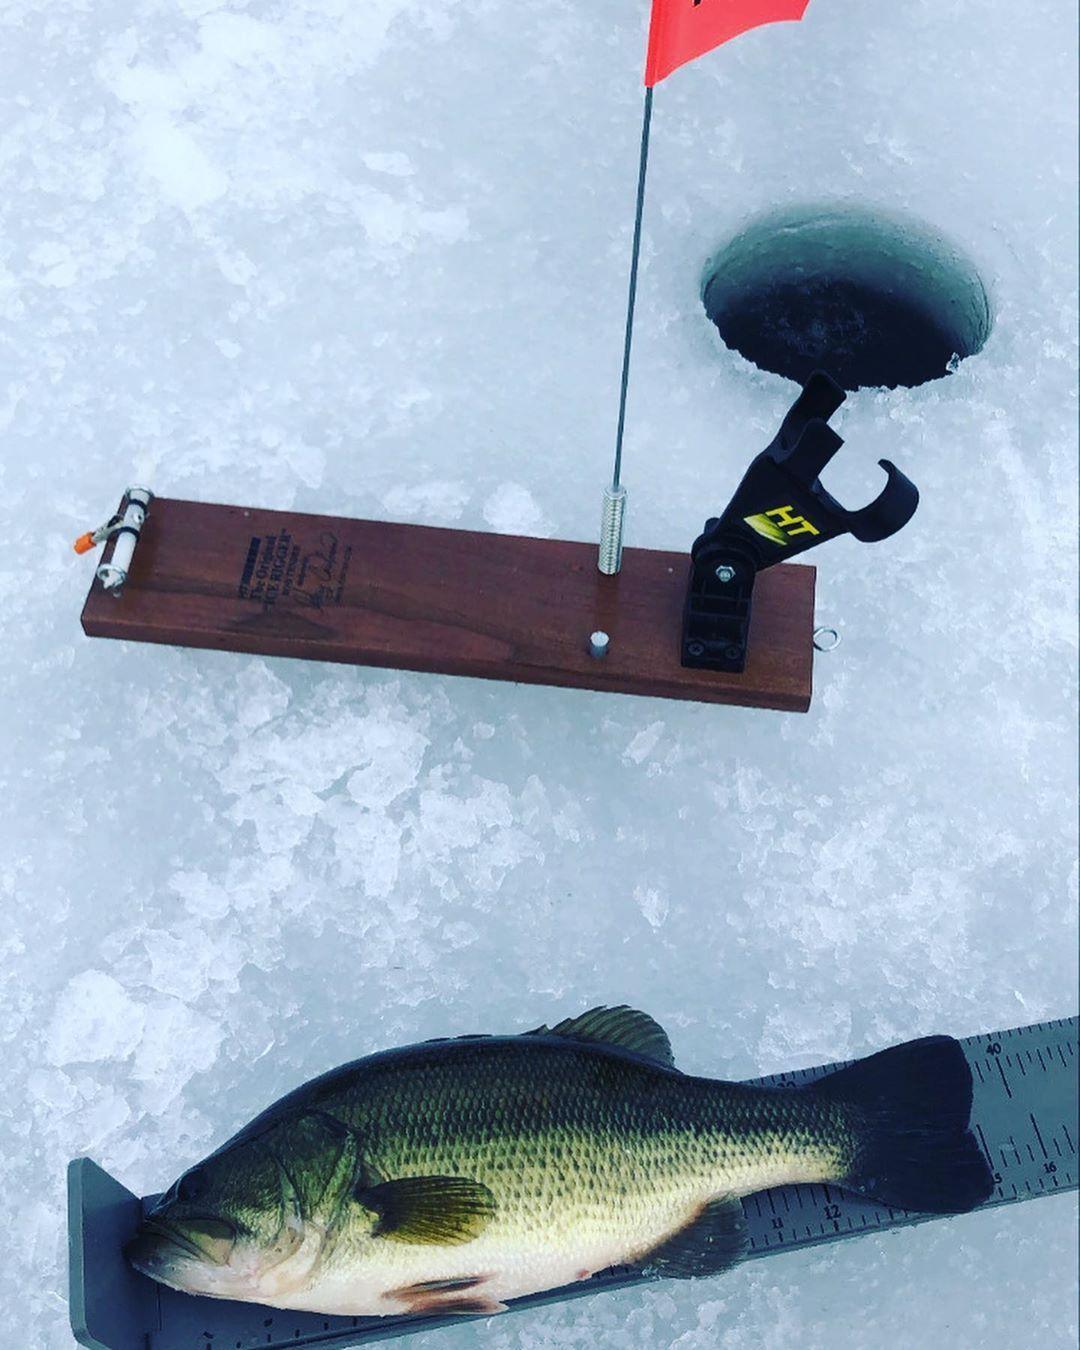 HT Rod Holder Tip Up in 2020 Winter fishing, Rod holder